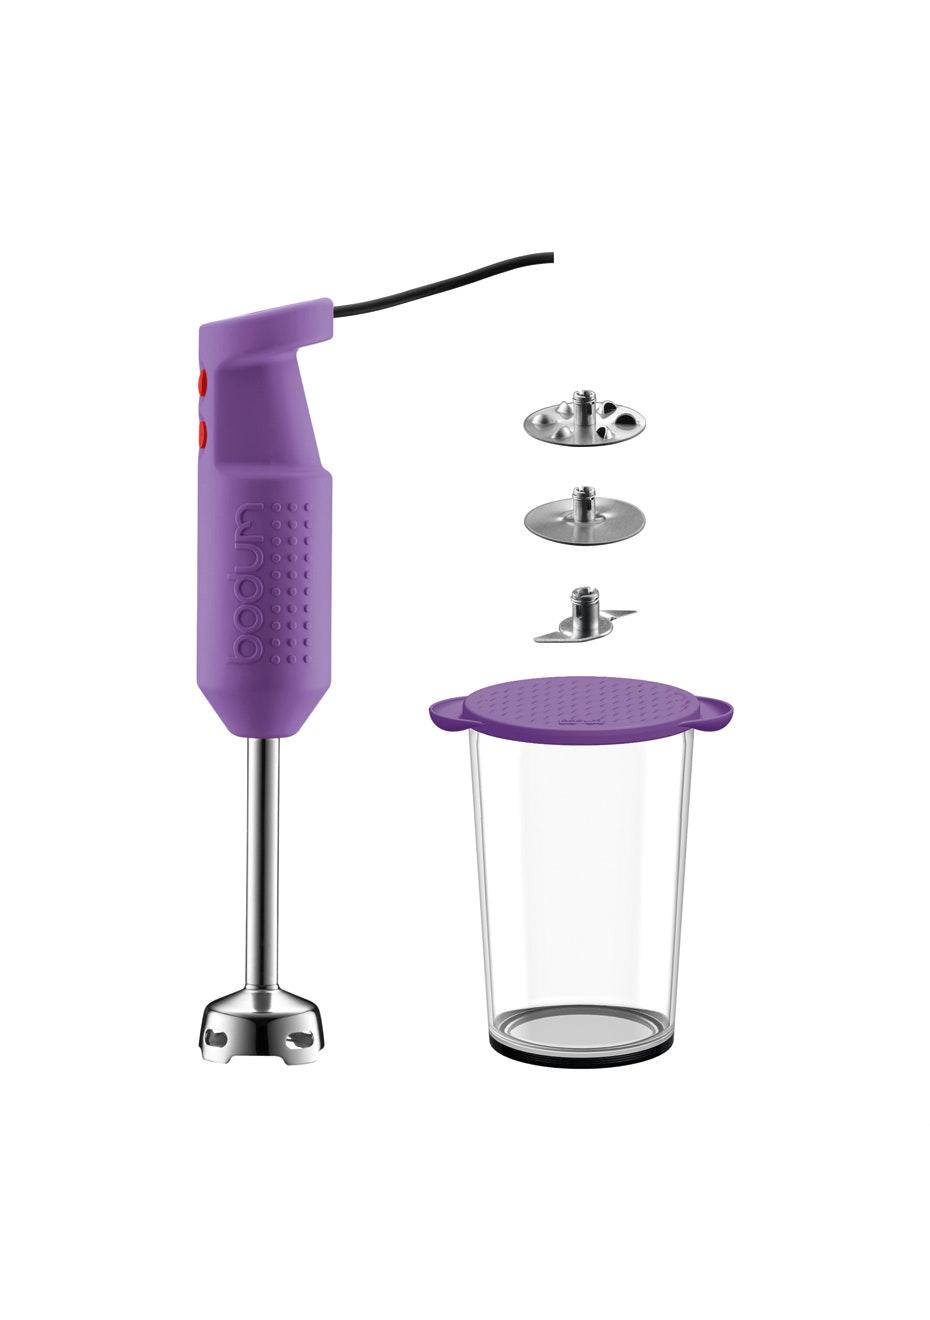 Bodum - Electric Blender Stick With Accessories - Purple